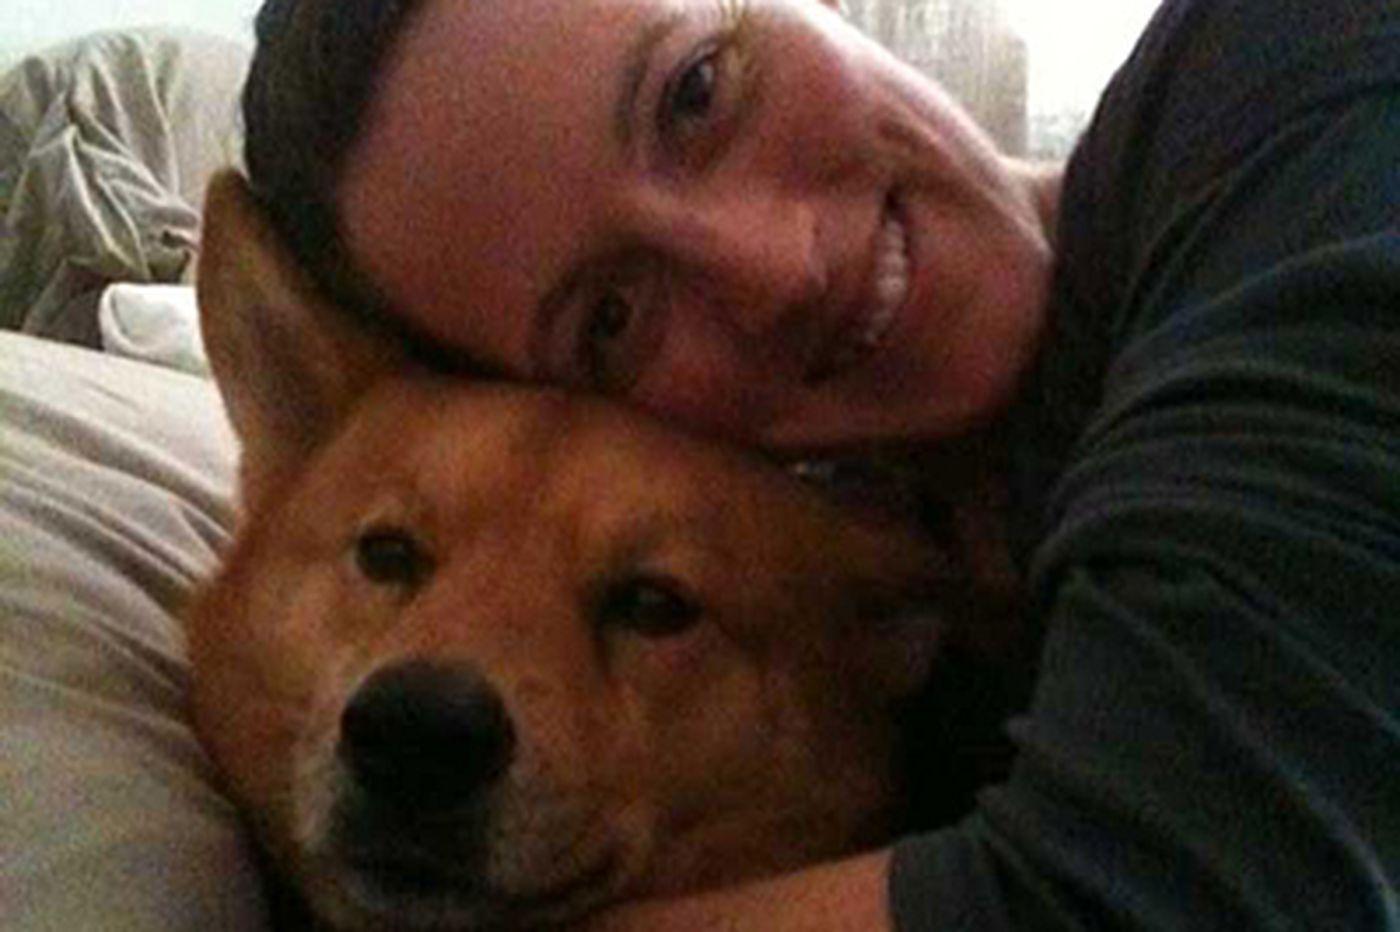 Stu Bykofsky: Gandhi example extends to pets